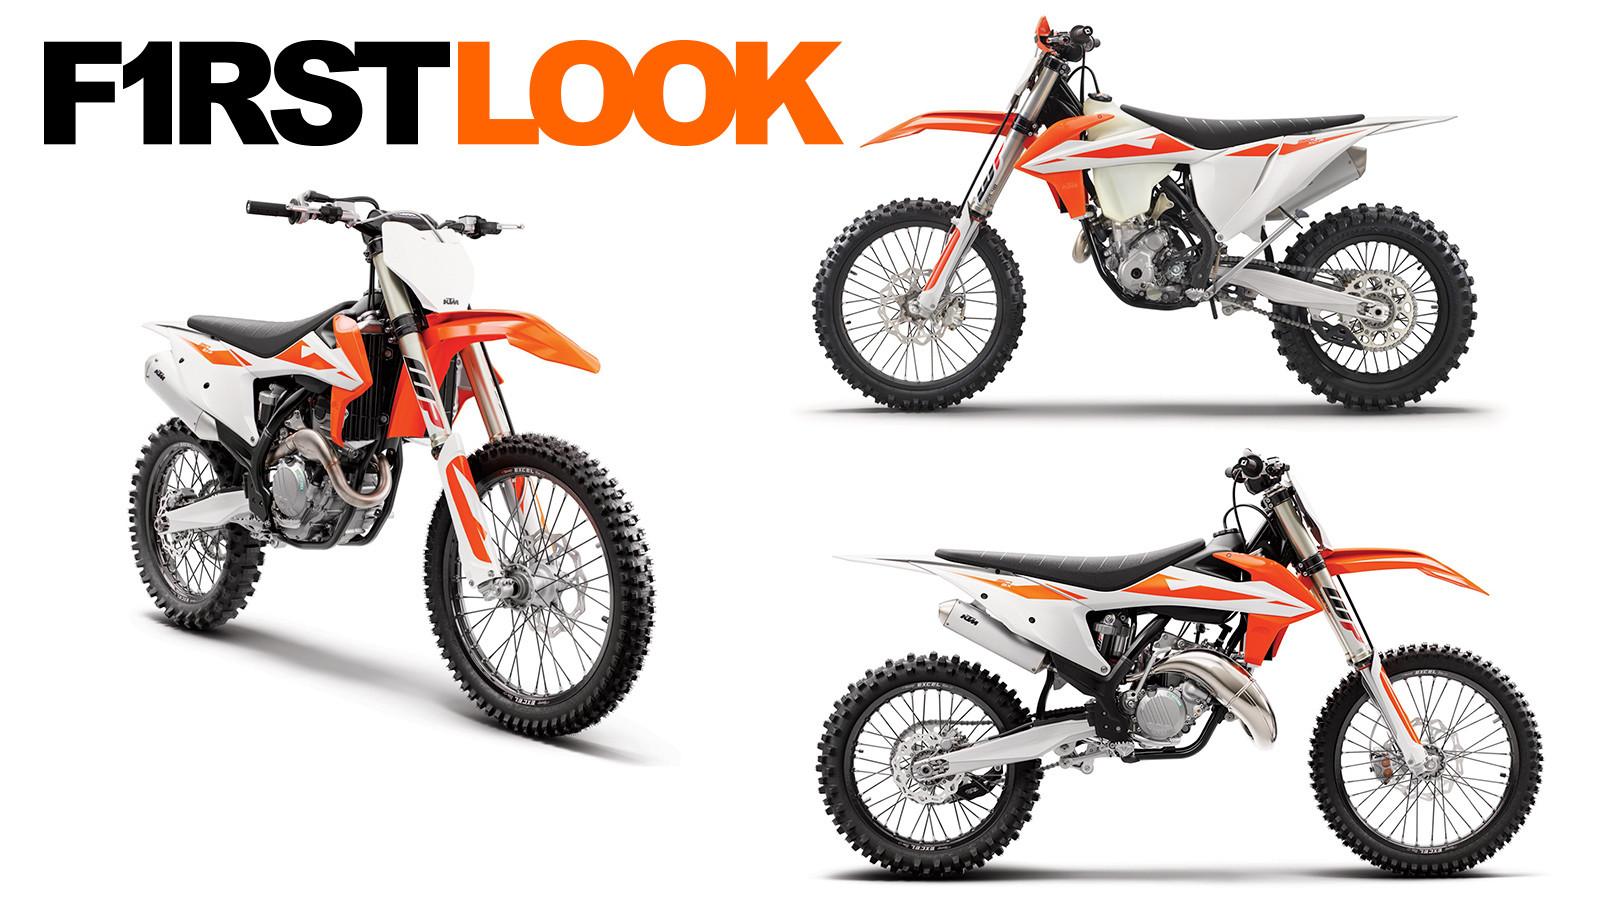 KTM EXC EXC-F 125 250 350 450 MOTOCROSS MX GRAPHICS SPLIT KIT 6 DAYS